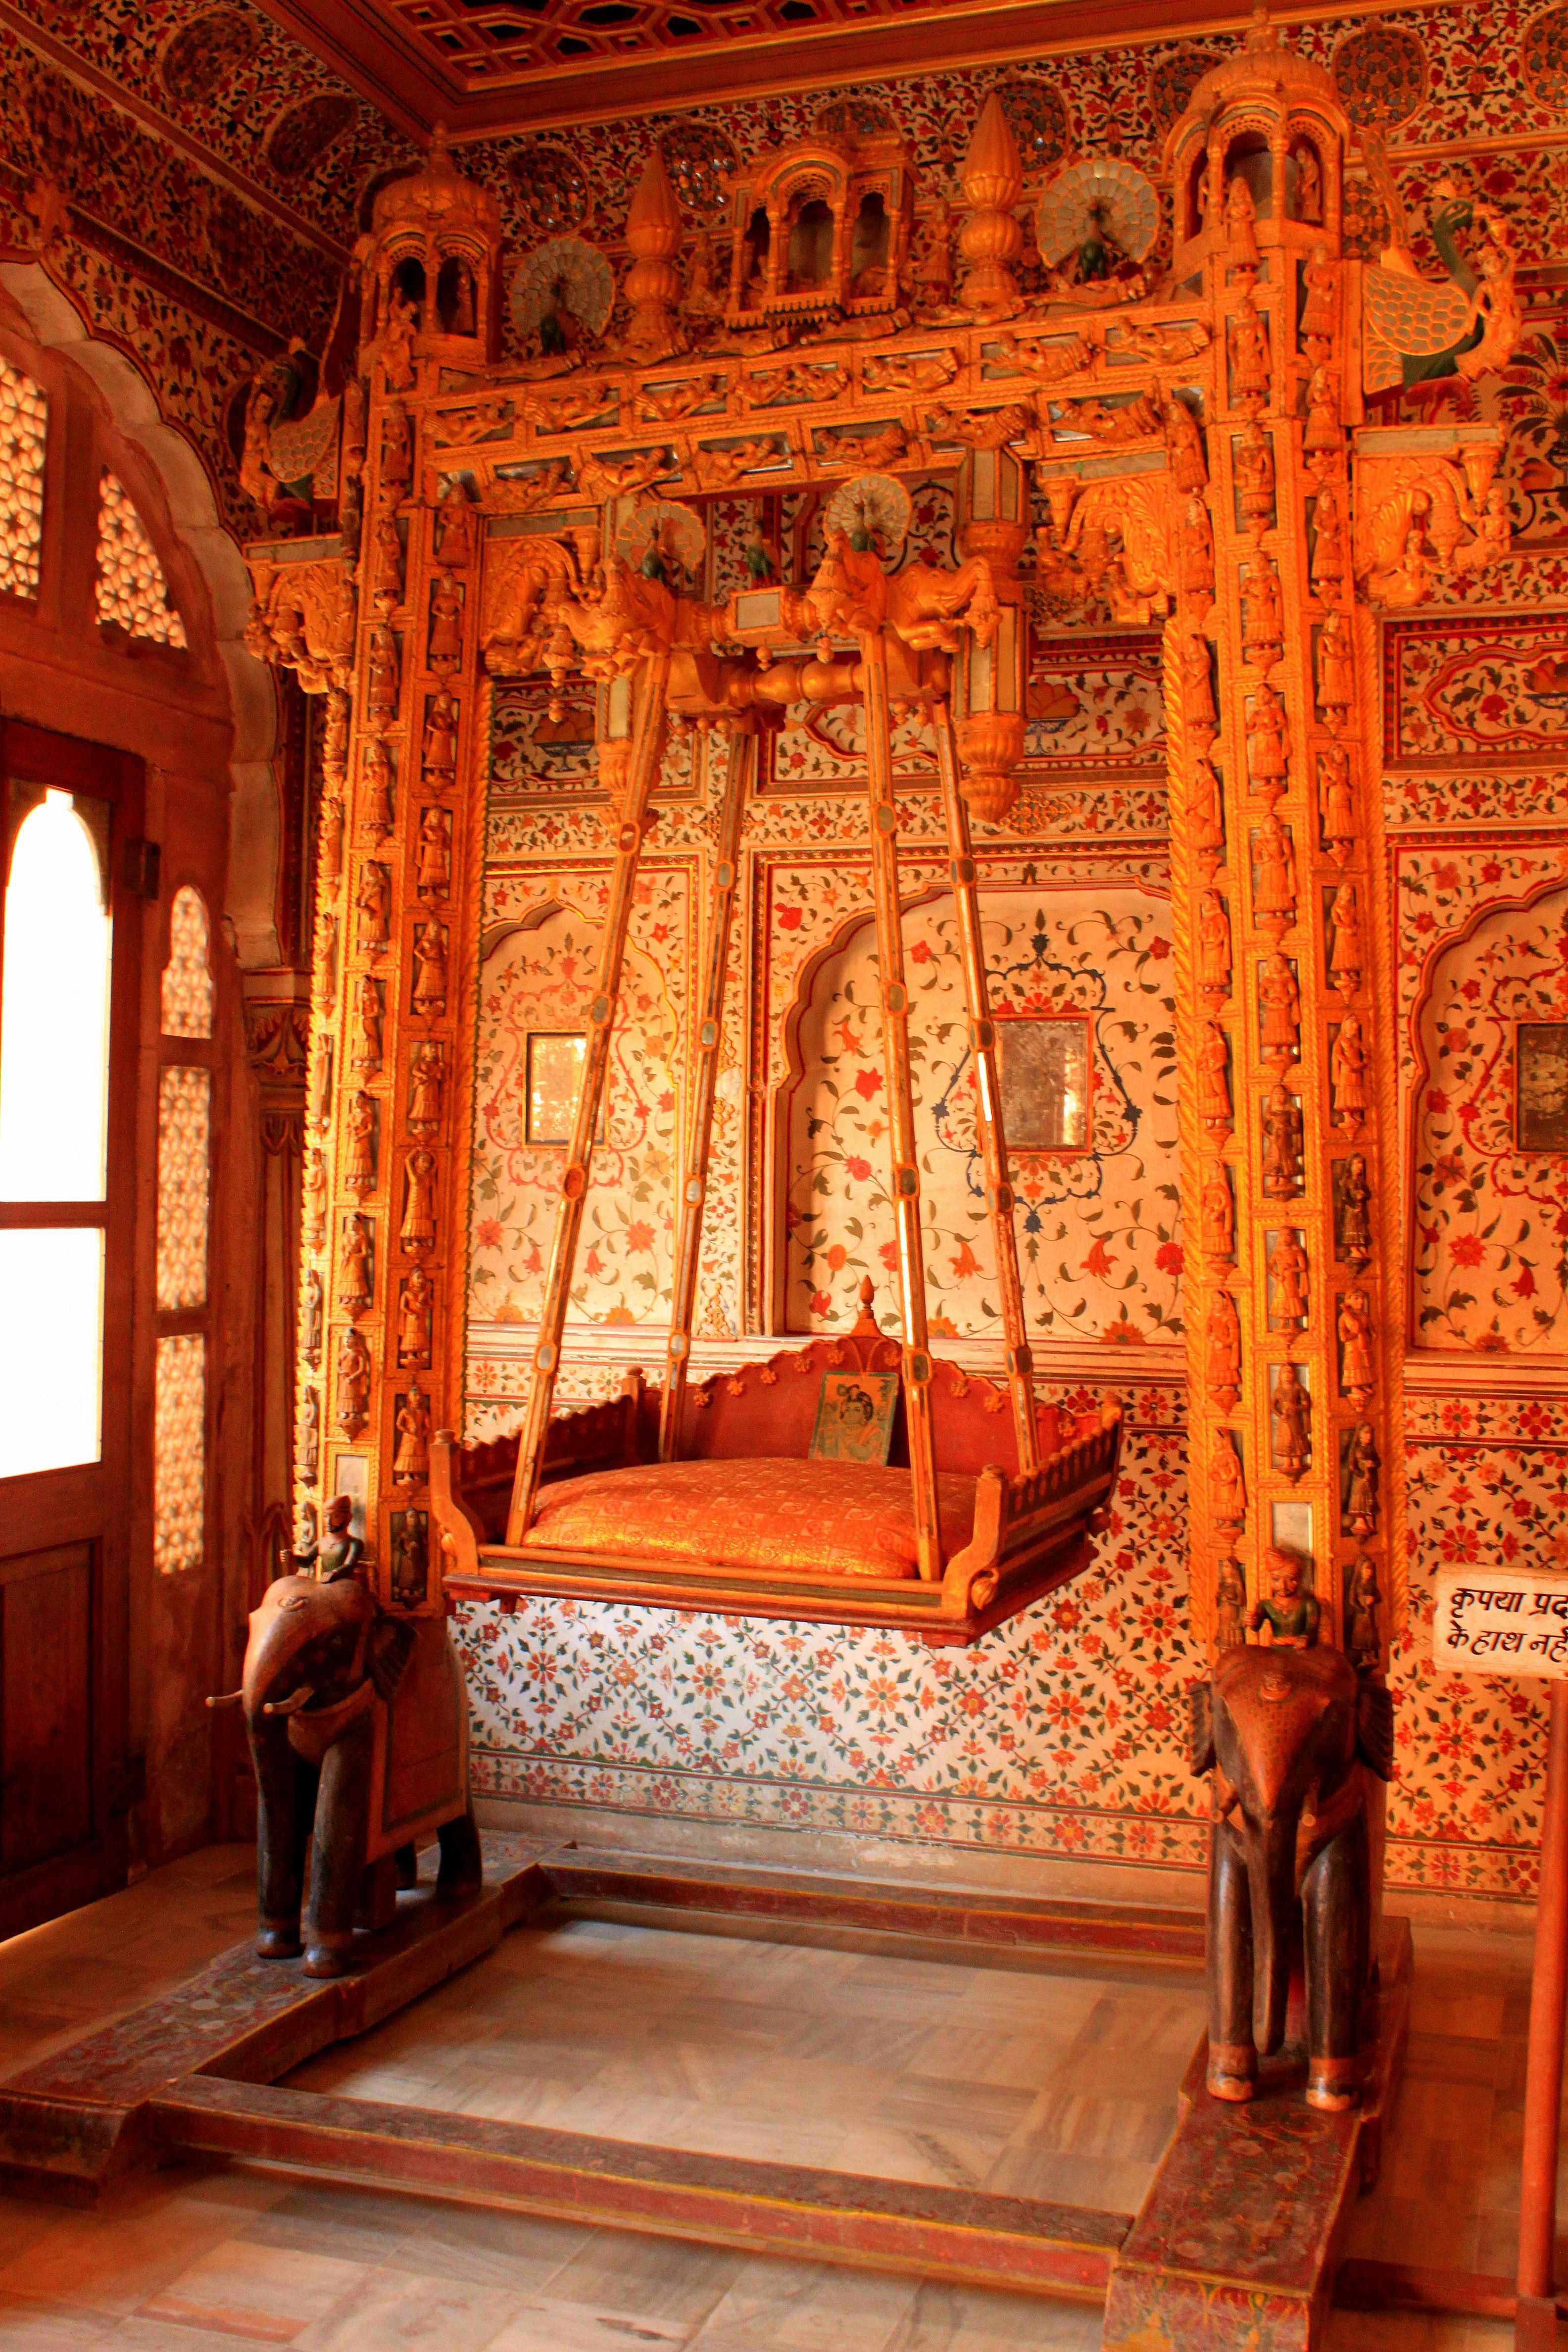 indian palace bedroom Rajastan India | travel in 2019 | Asian interior design